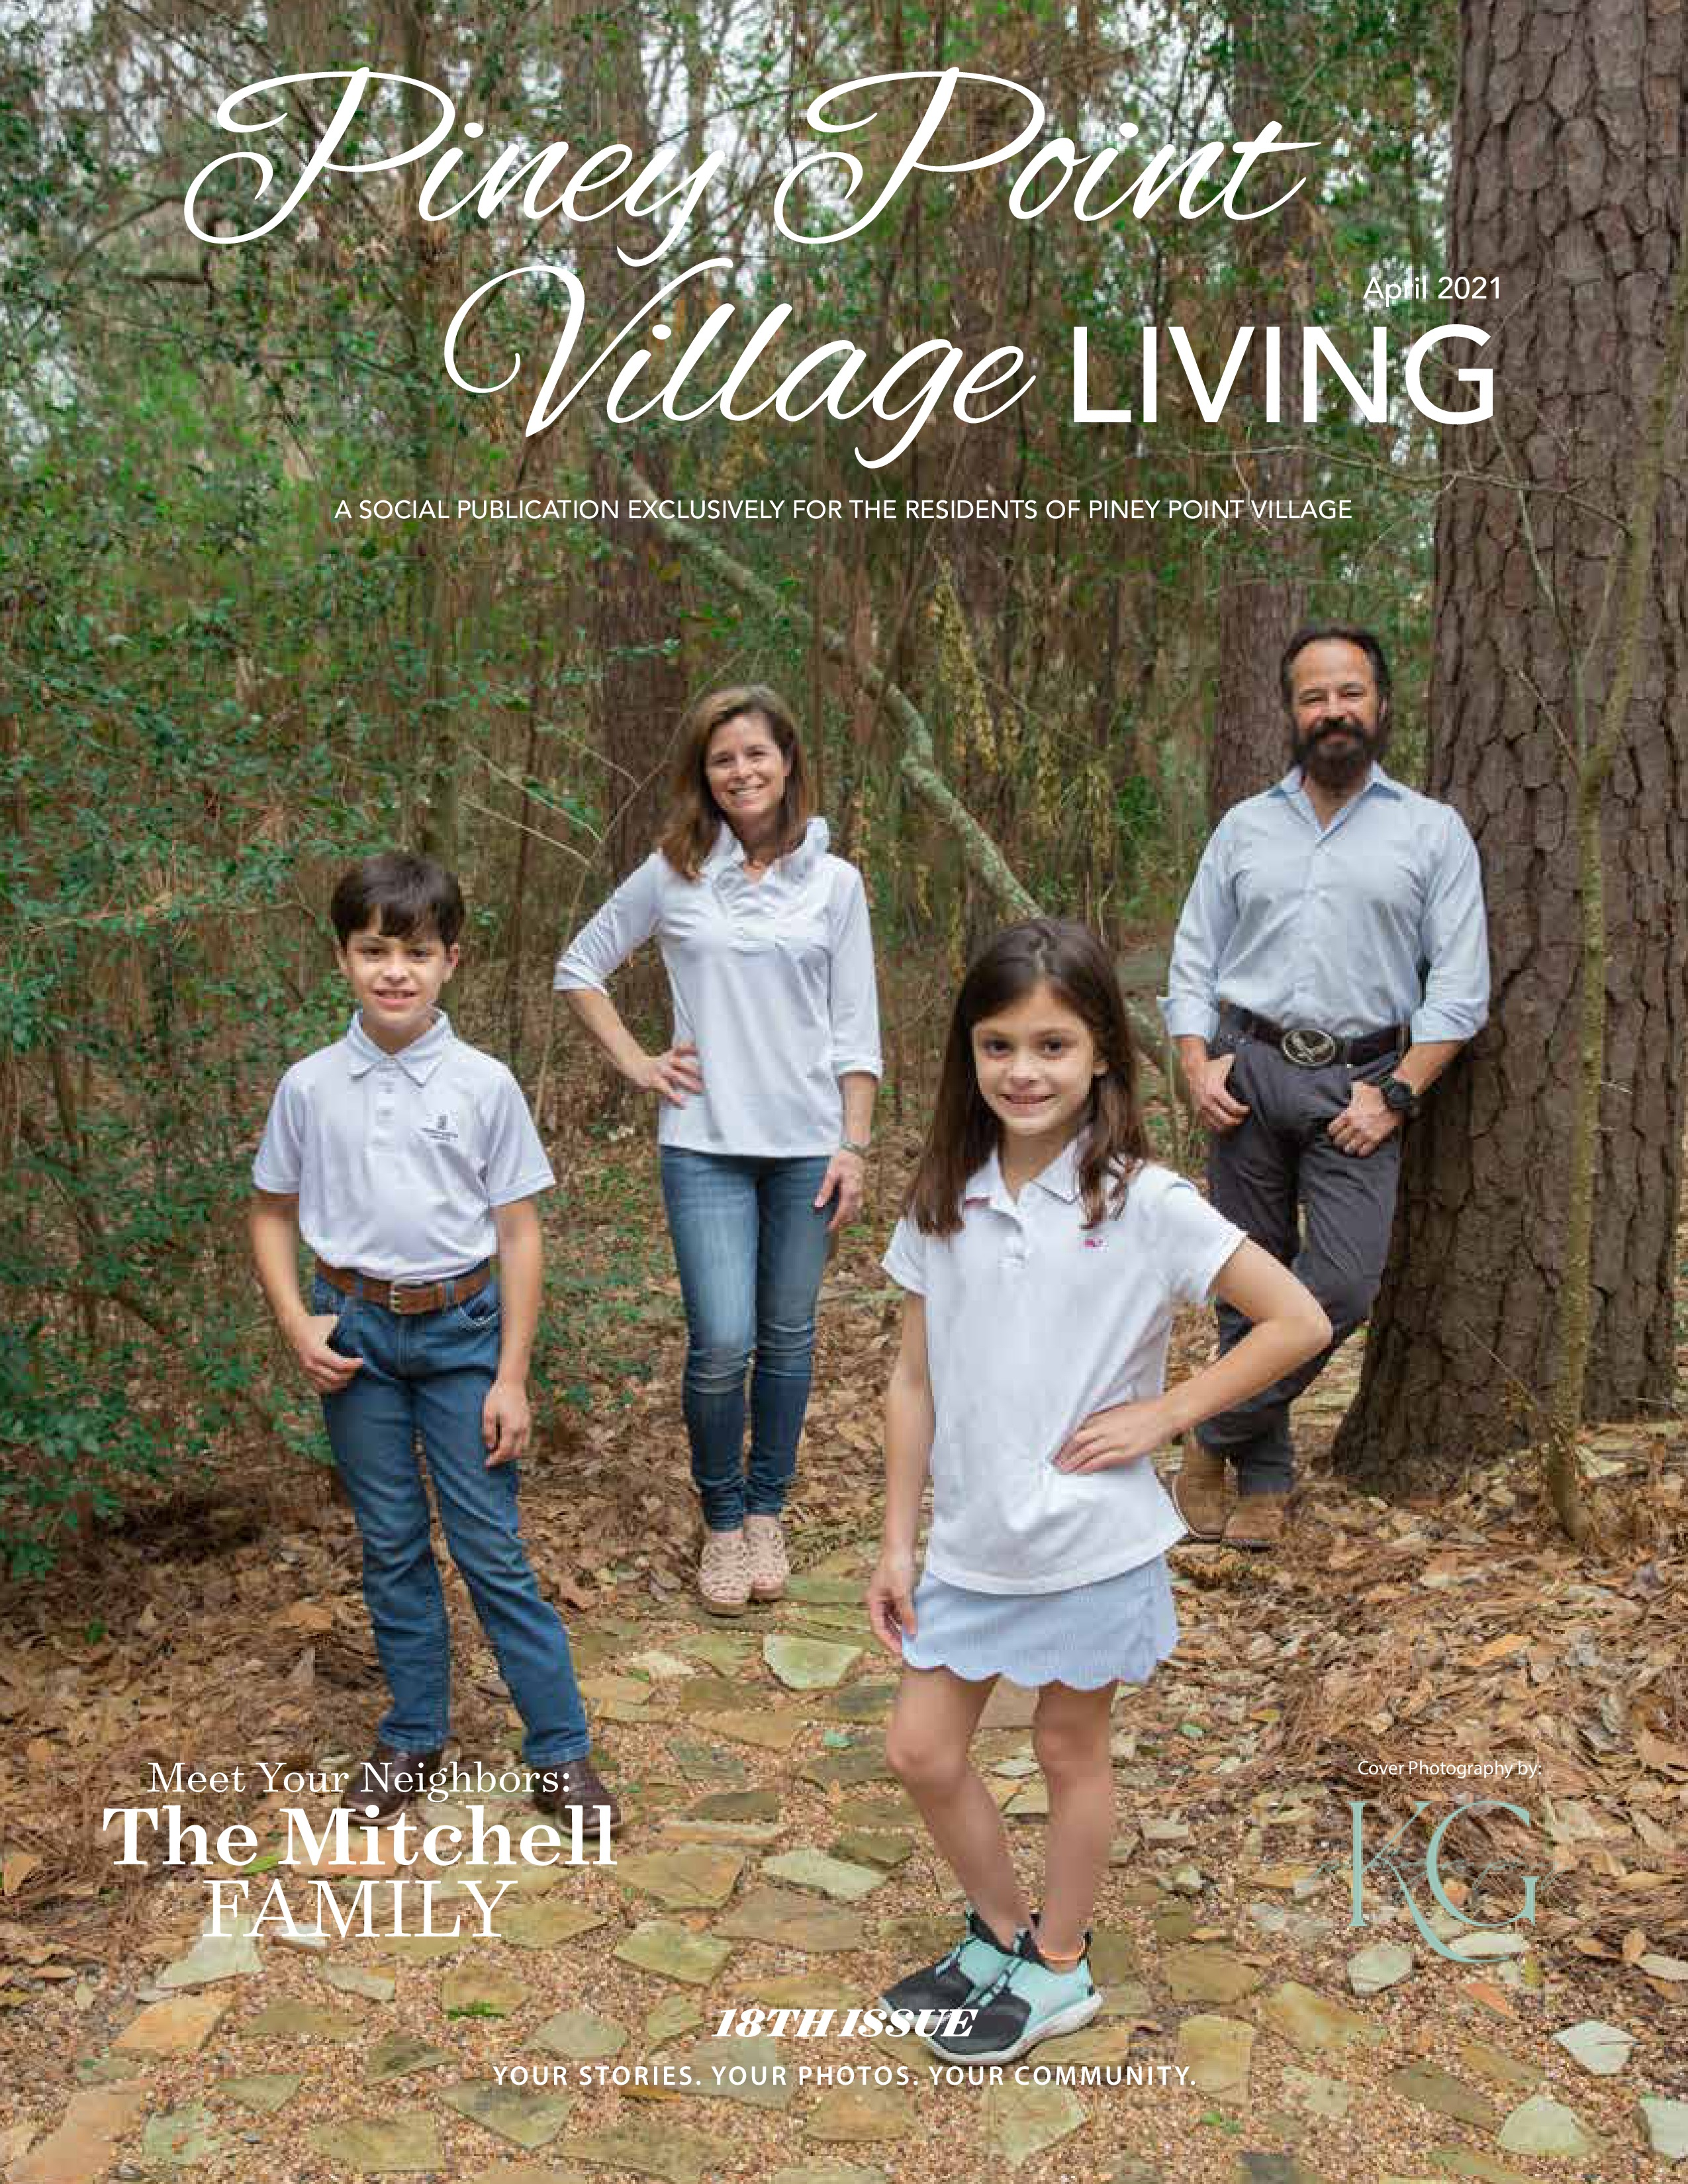 Piney Point Village Living 2021-04-01